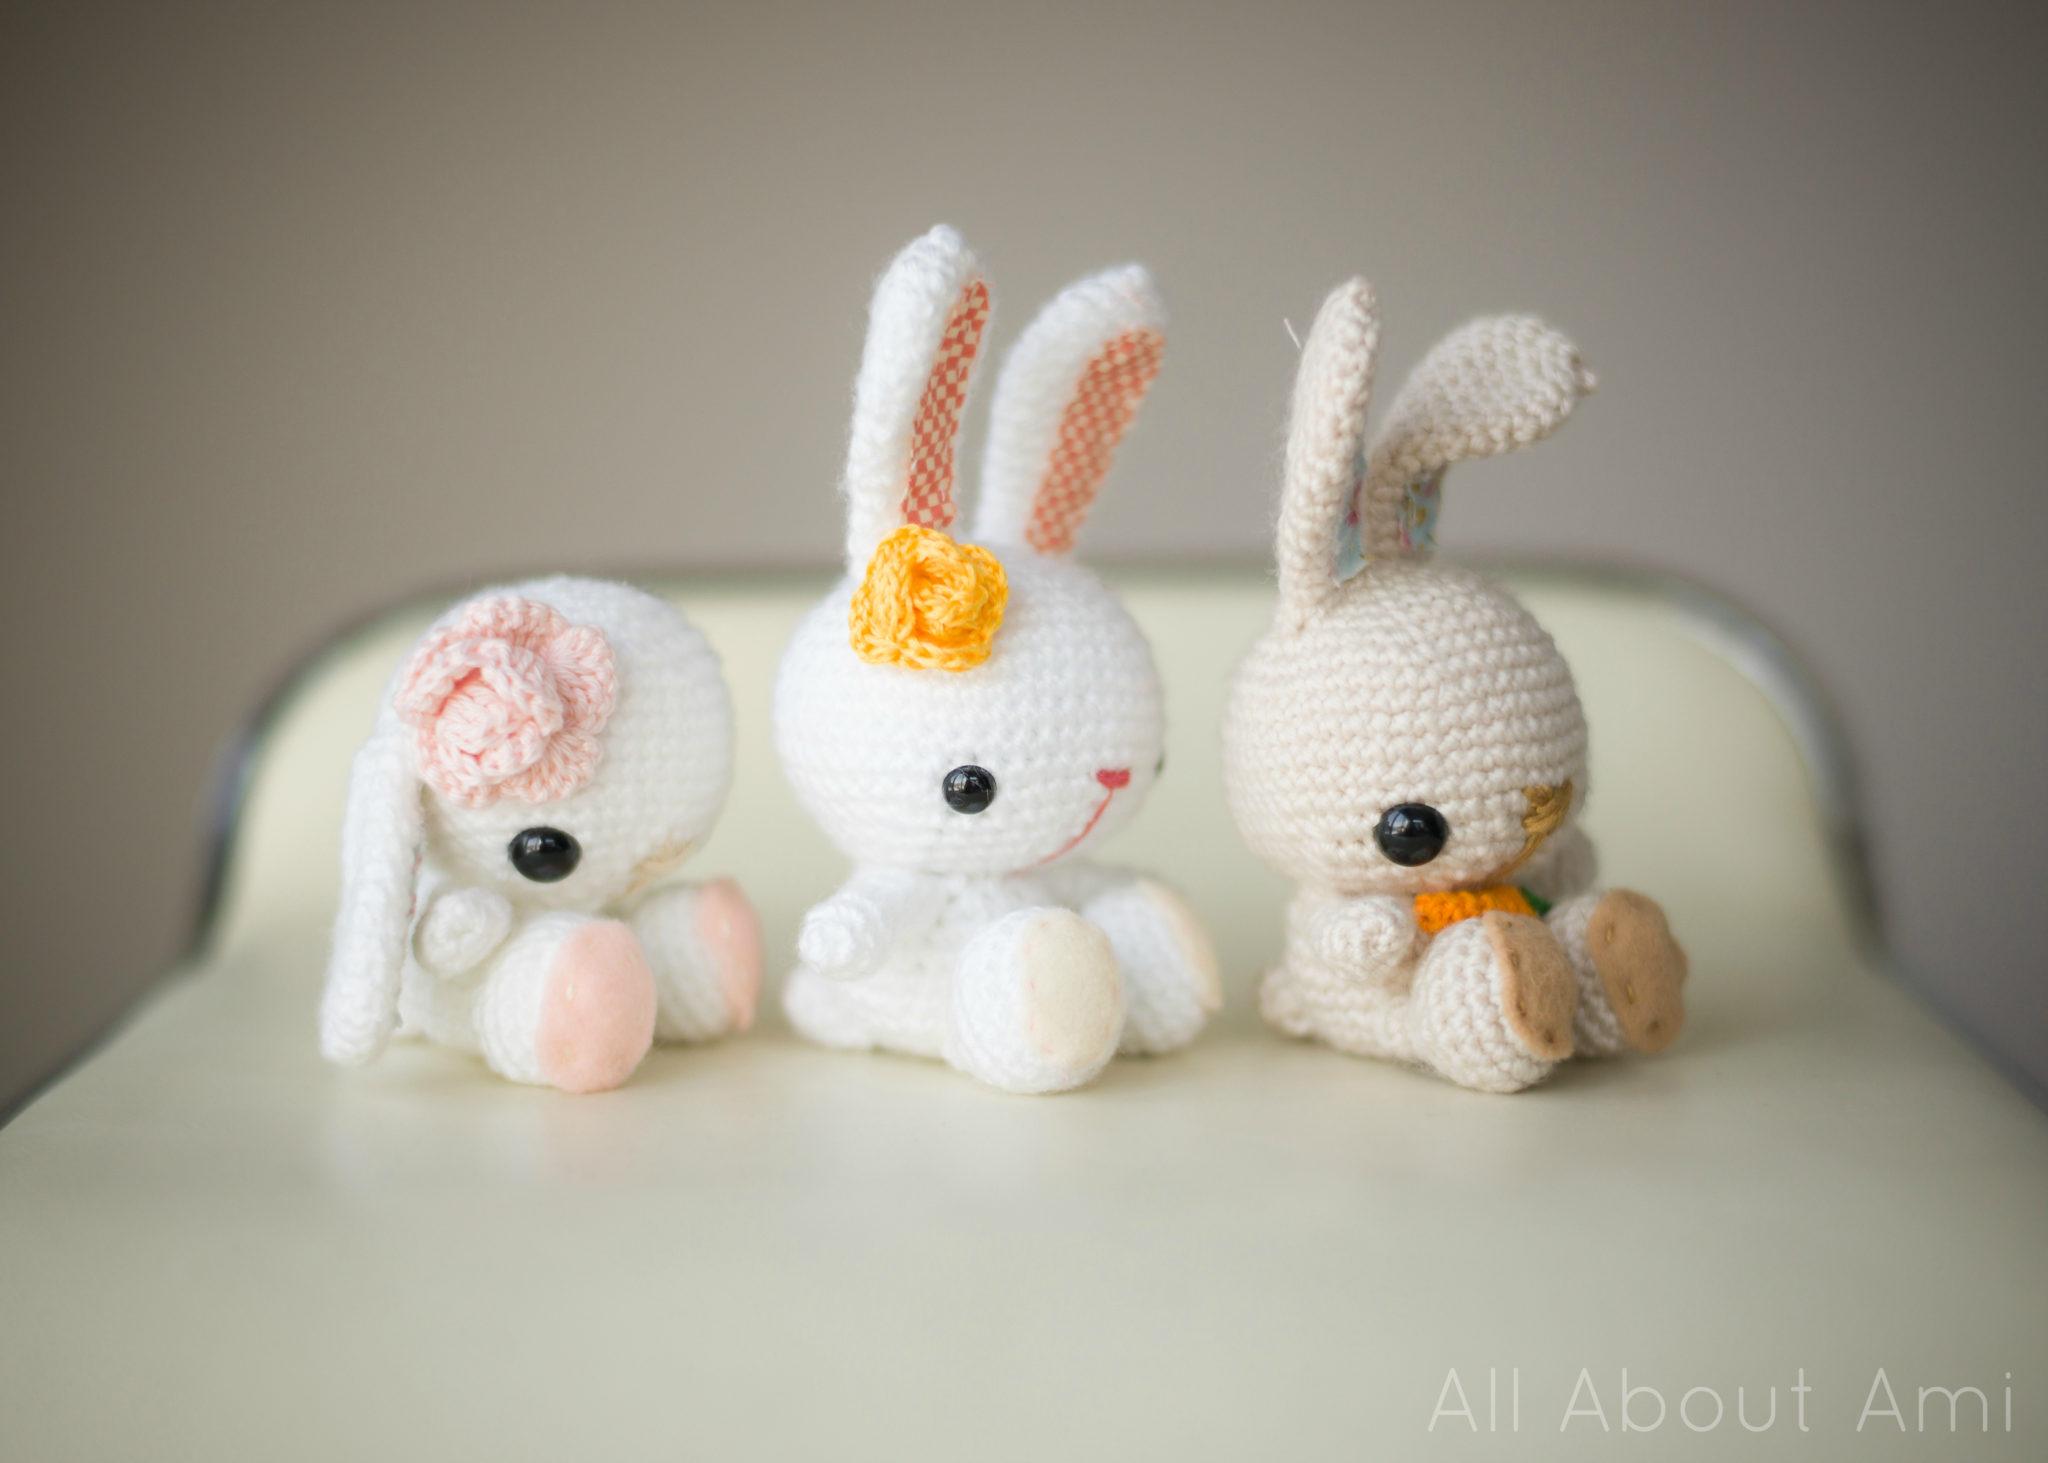 Honey Bunny Amigurumi Dress-Up Doll with Garden Play Mat: Crochet ... | 1463x2048